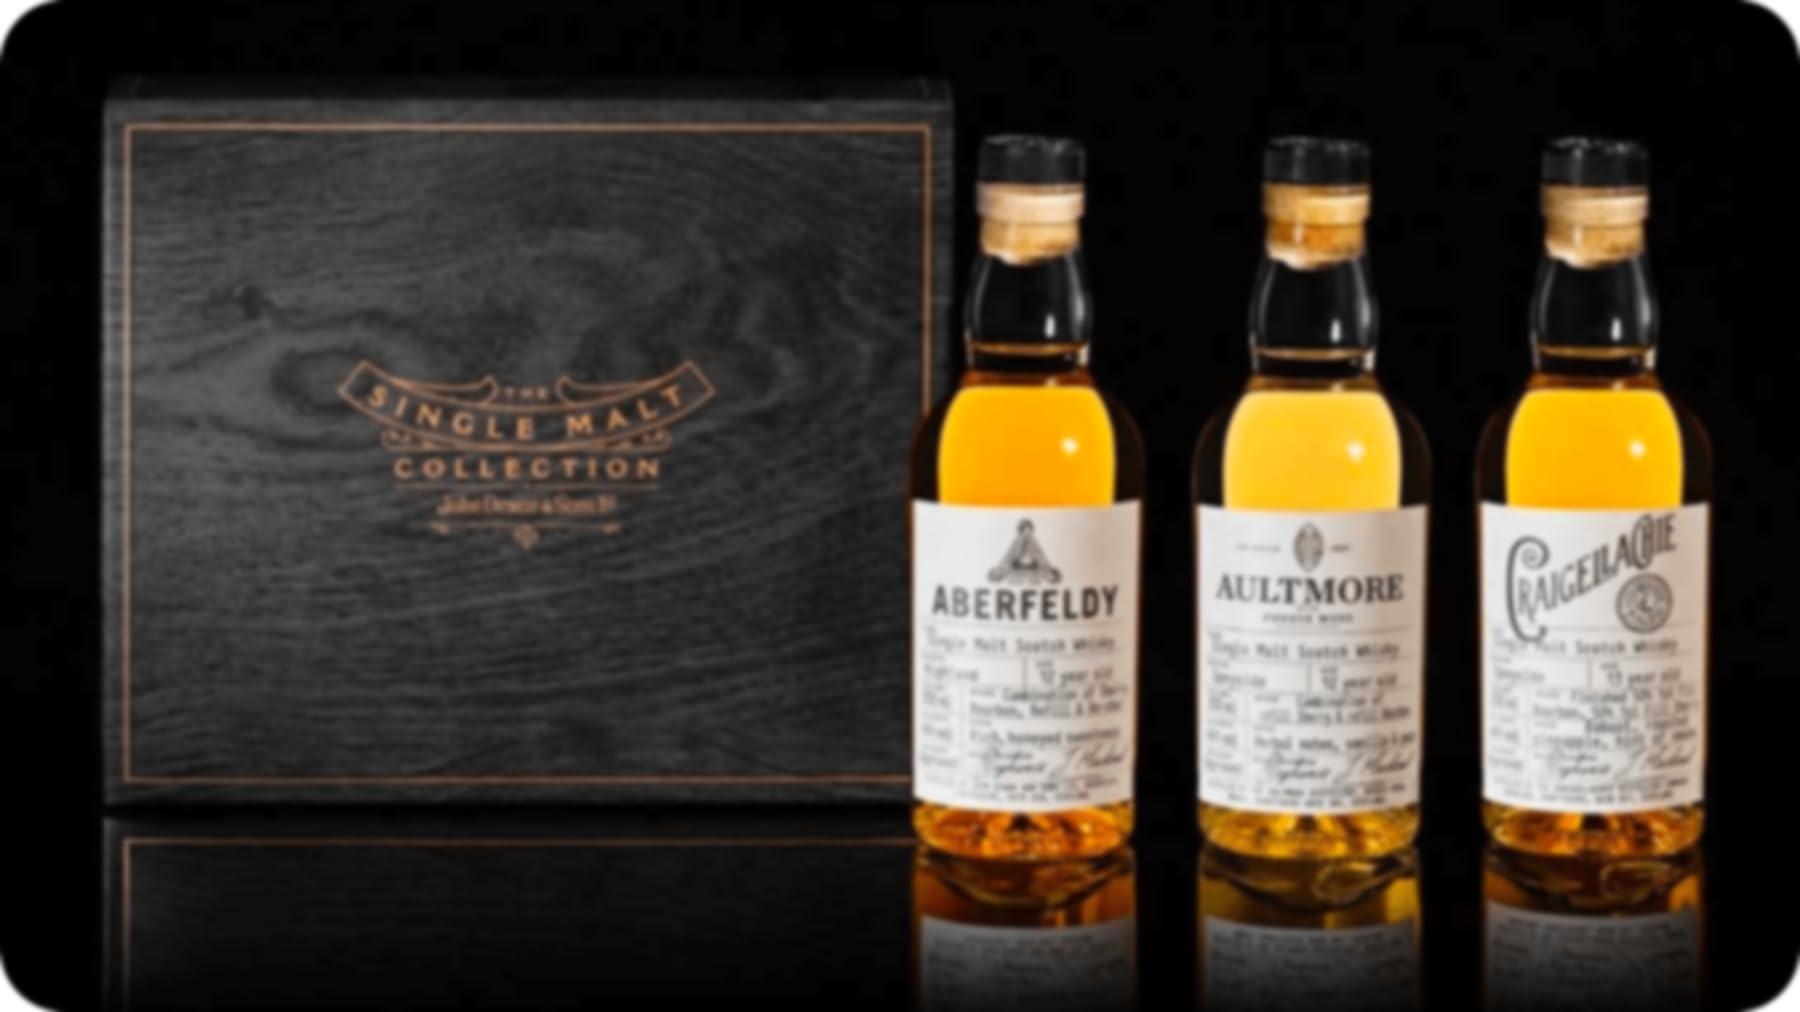 aberfeldy, aultmore, and Craigellachie malt whiskey